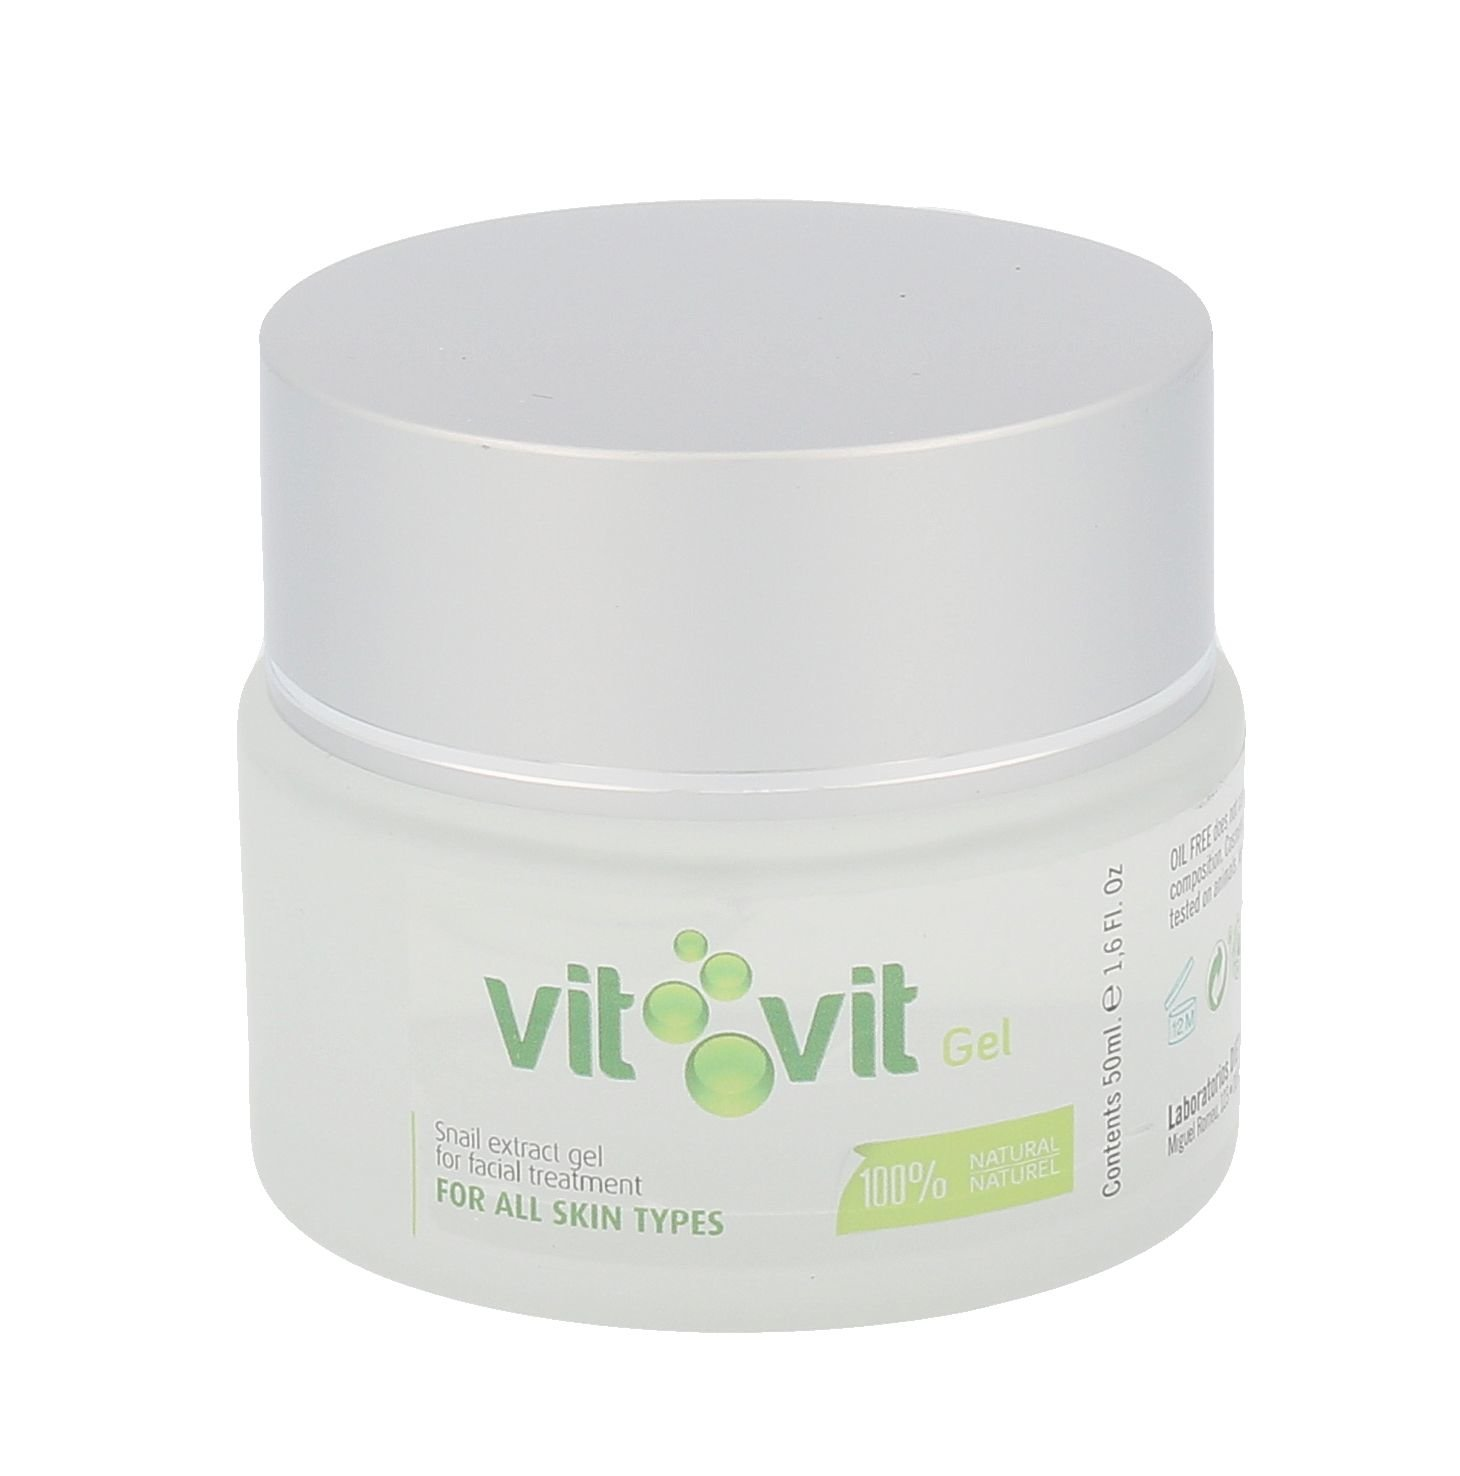 Diet Esthetic Vit Vit Cosmetic 50ml